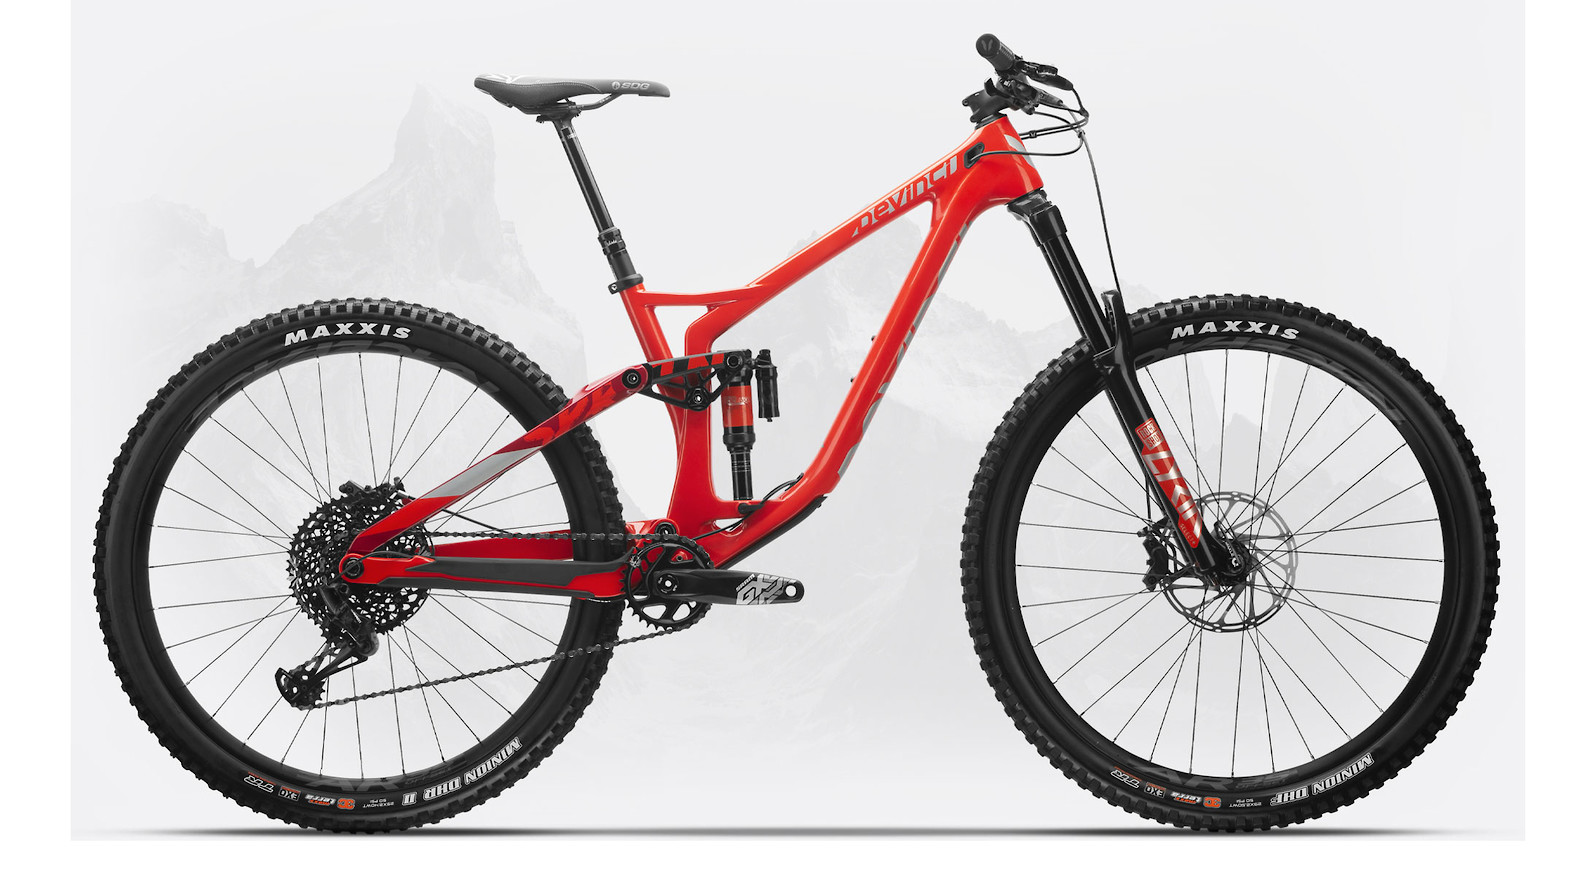 New MTB Downhill Bicycle Bike Riser Handlebar 630mm 20mm Rise White